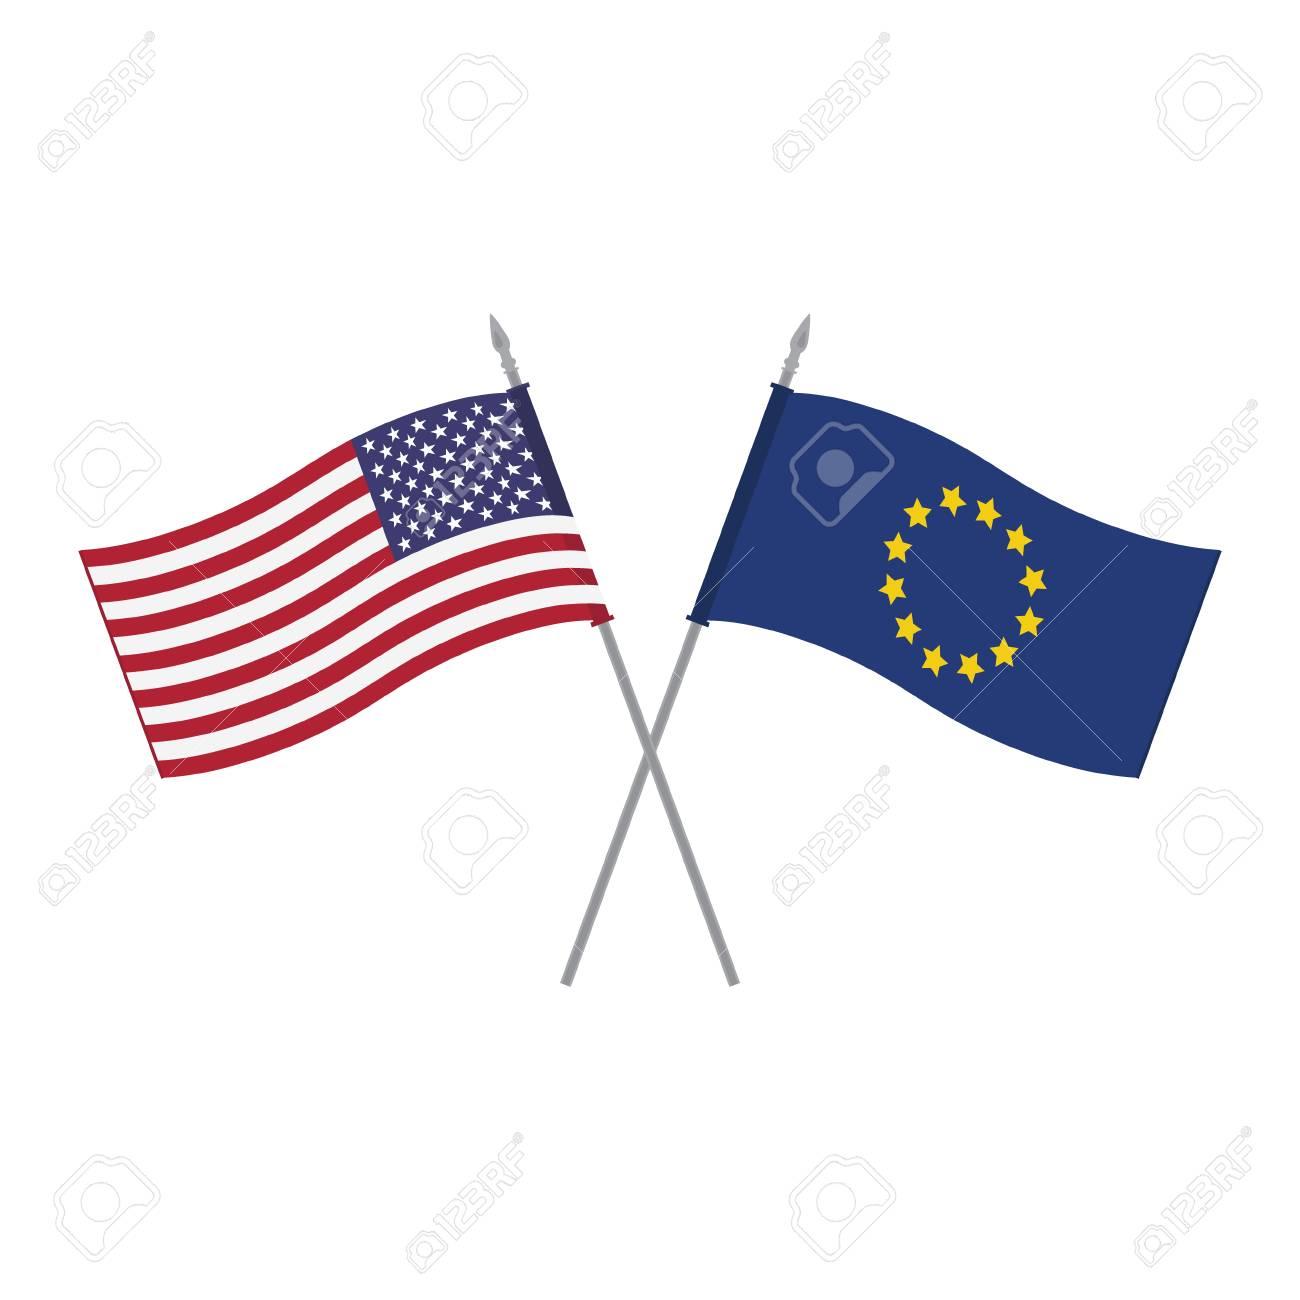 Vektor-Illustration EU Und USA Vektor-Tabelle Flaggen Vorlage ...